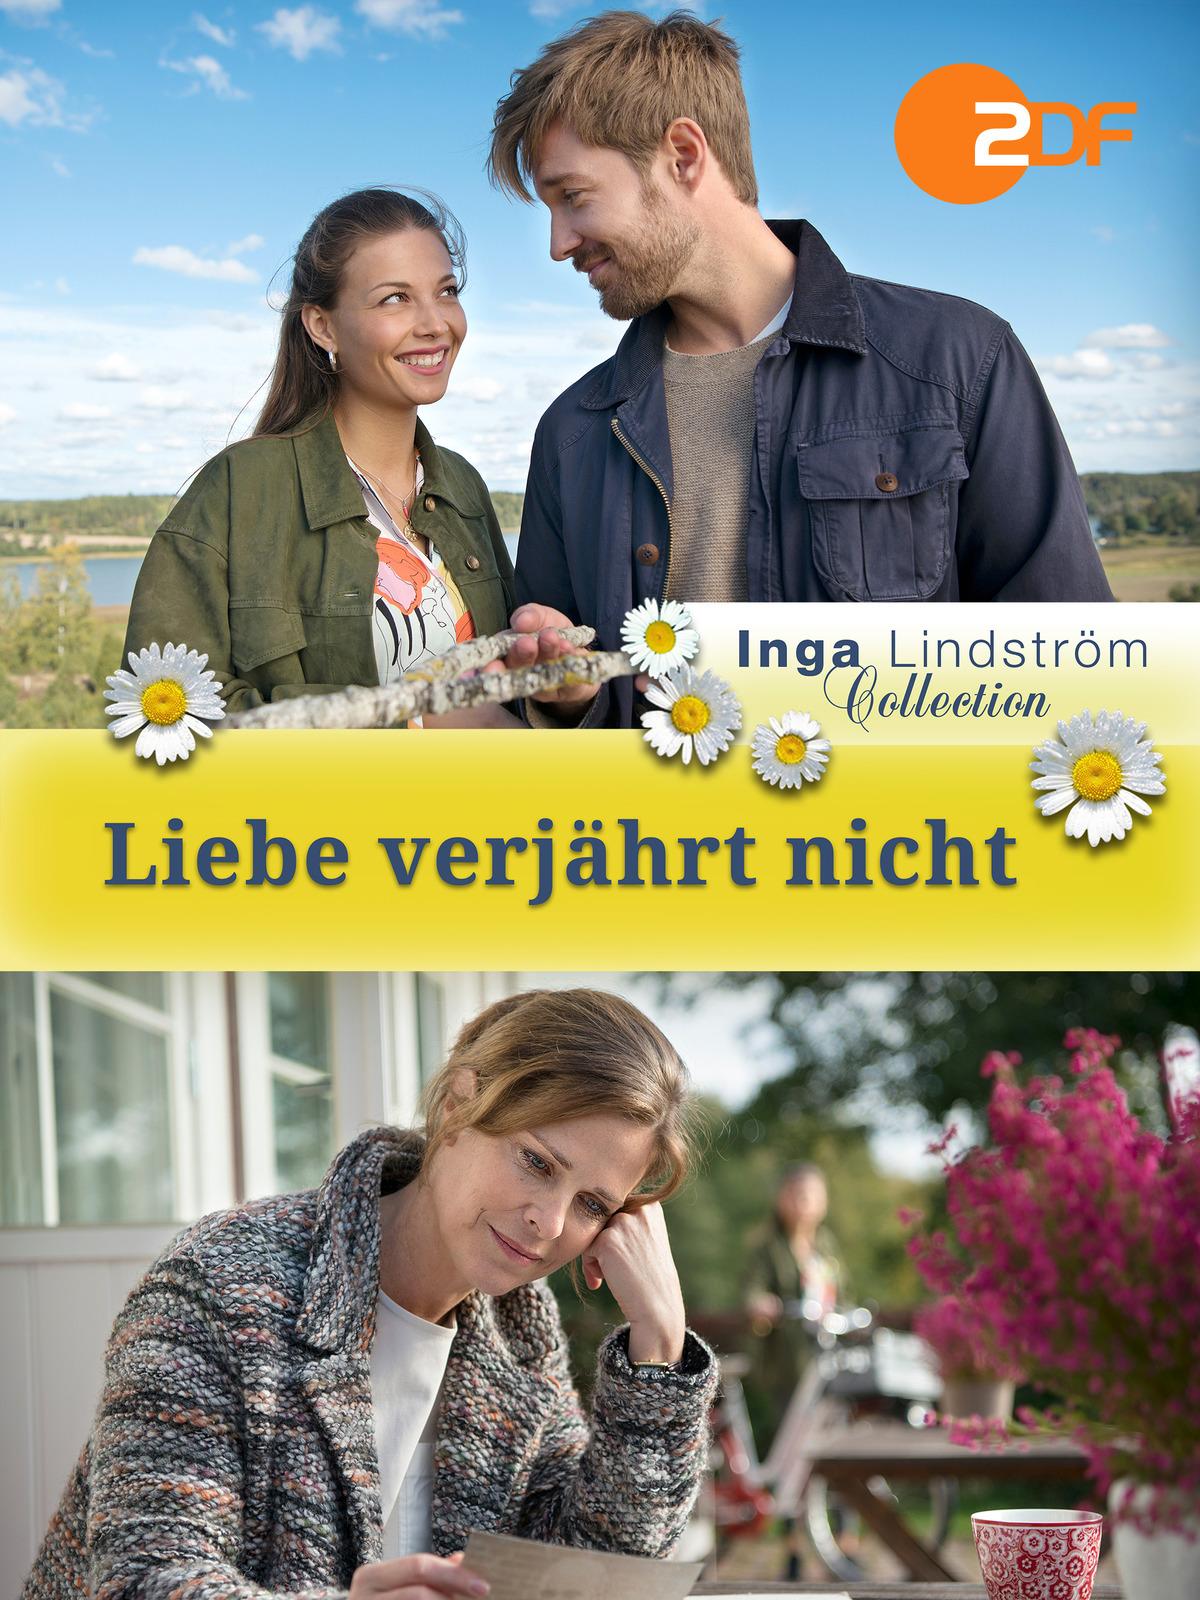 Inga Lindström - Liebe verjährt nicht